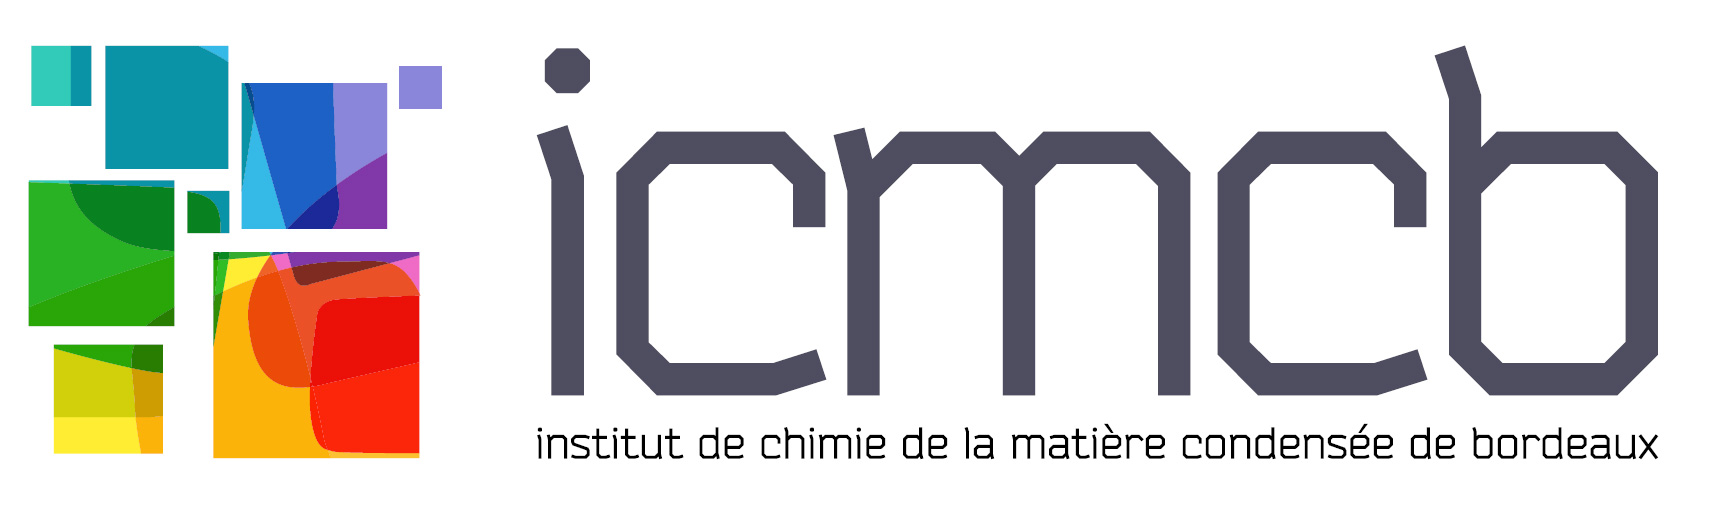 ICMCB